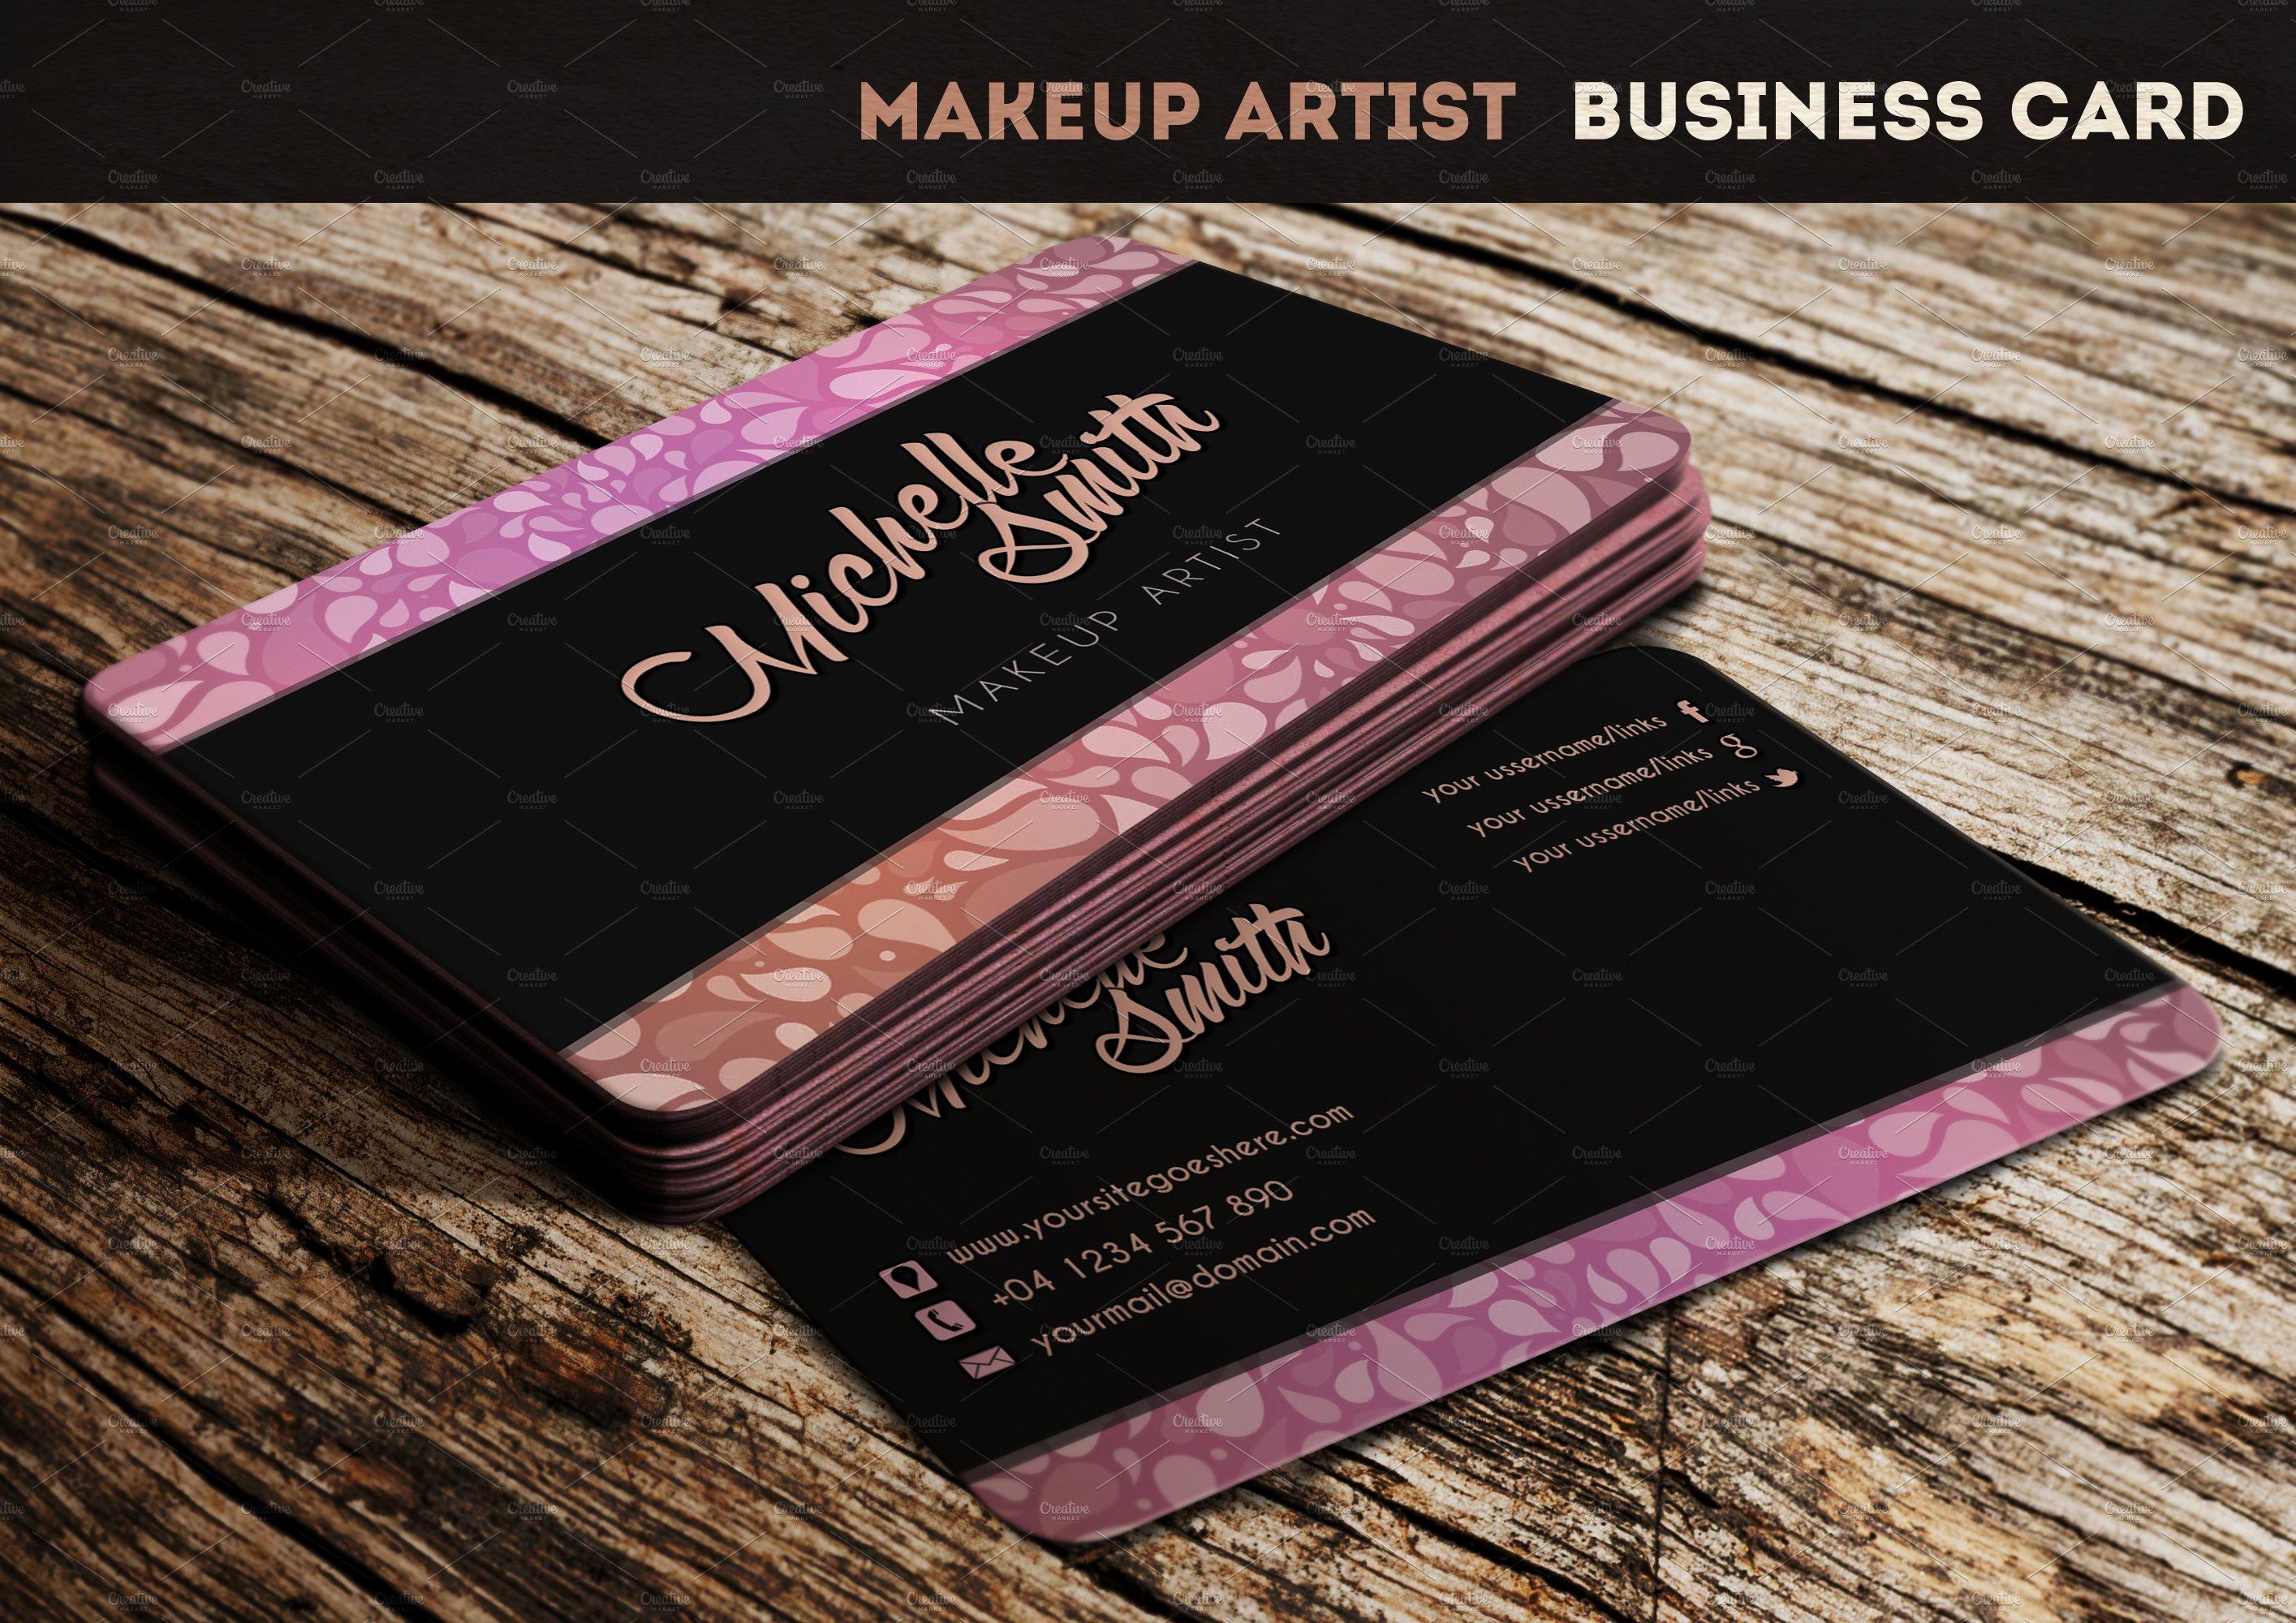 Business Cards for Artists Unique Makeup Artist Business Card Business Card Templates